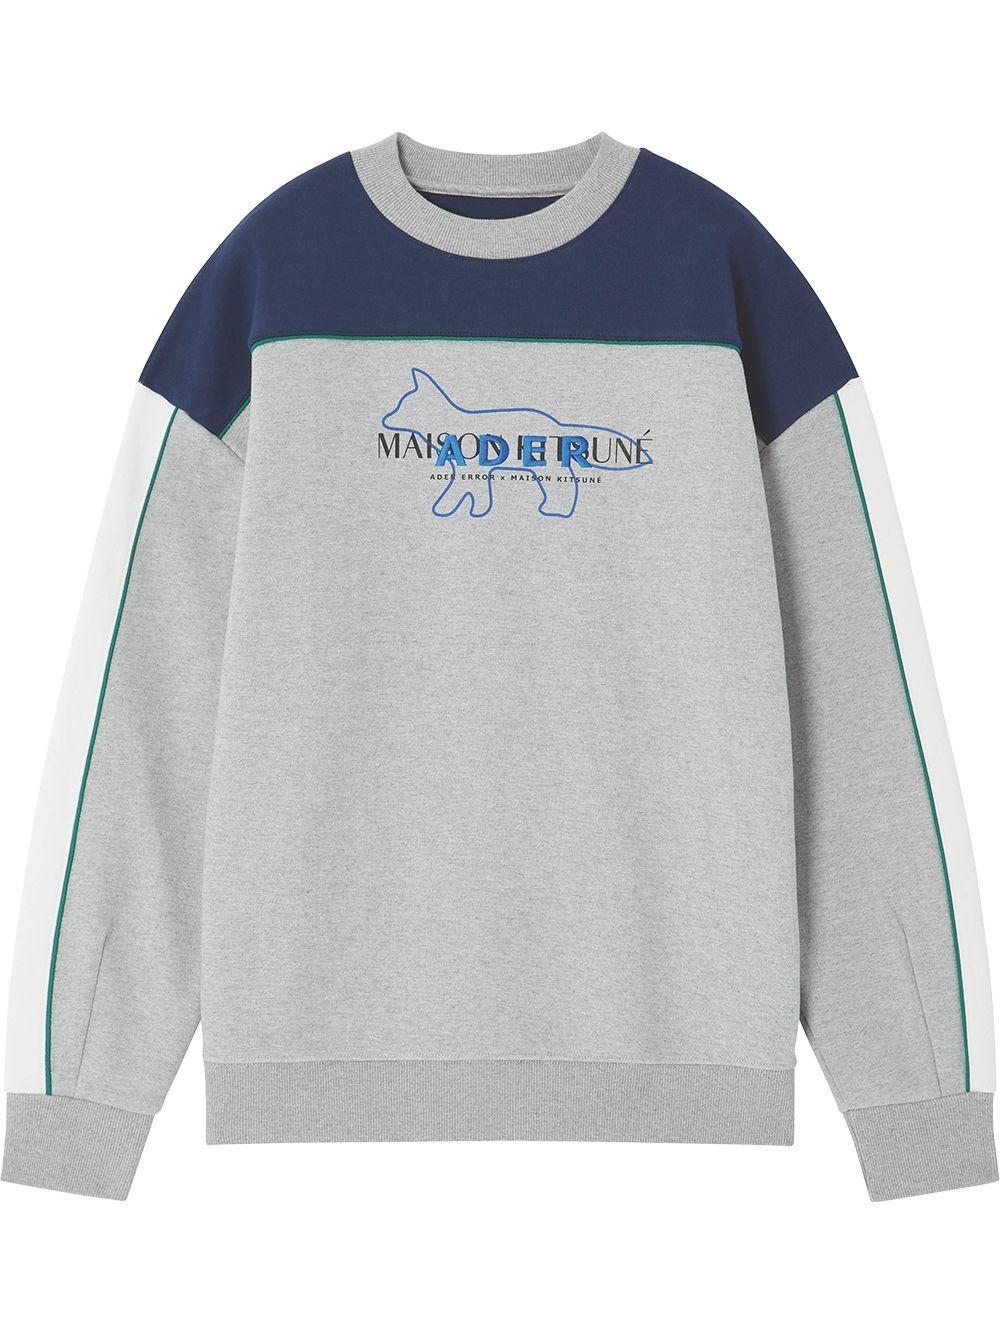 Maison Kitsune X Ader Error Logo Embroidered Sweatshirt Grey Embroidered Sweatshirts Sweatshirts Grey Sweatshirt [ 1334 x 1000 Pixel ]